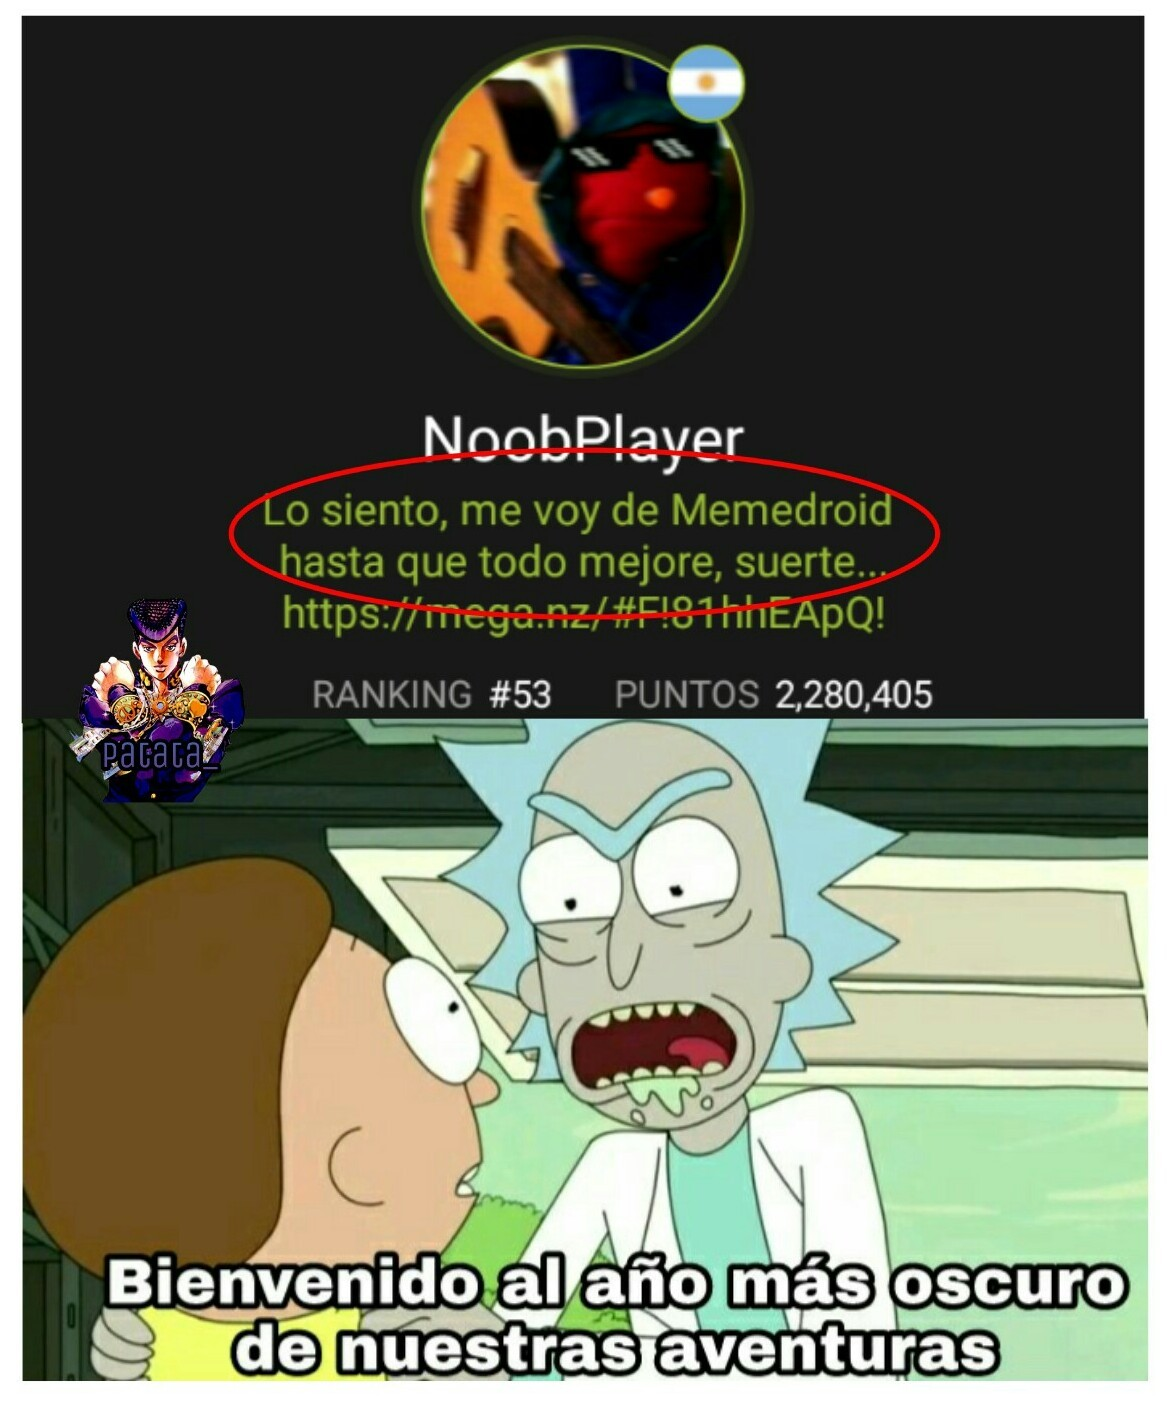 Mensaje oculto en la imagen de NoobPlayer - meme